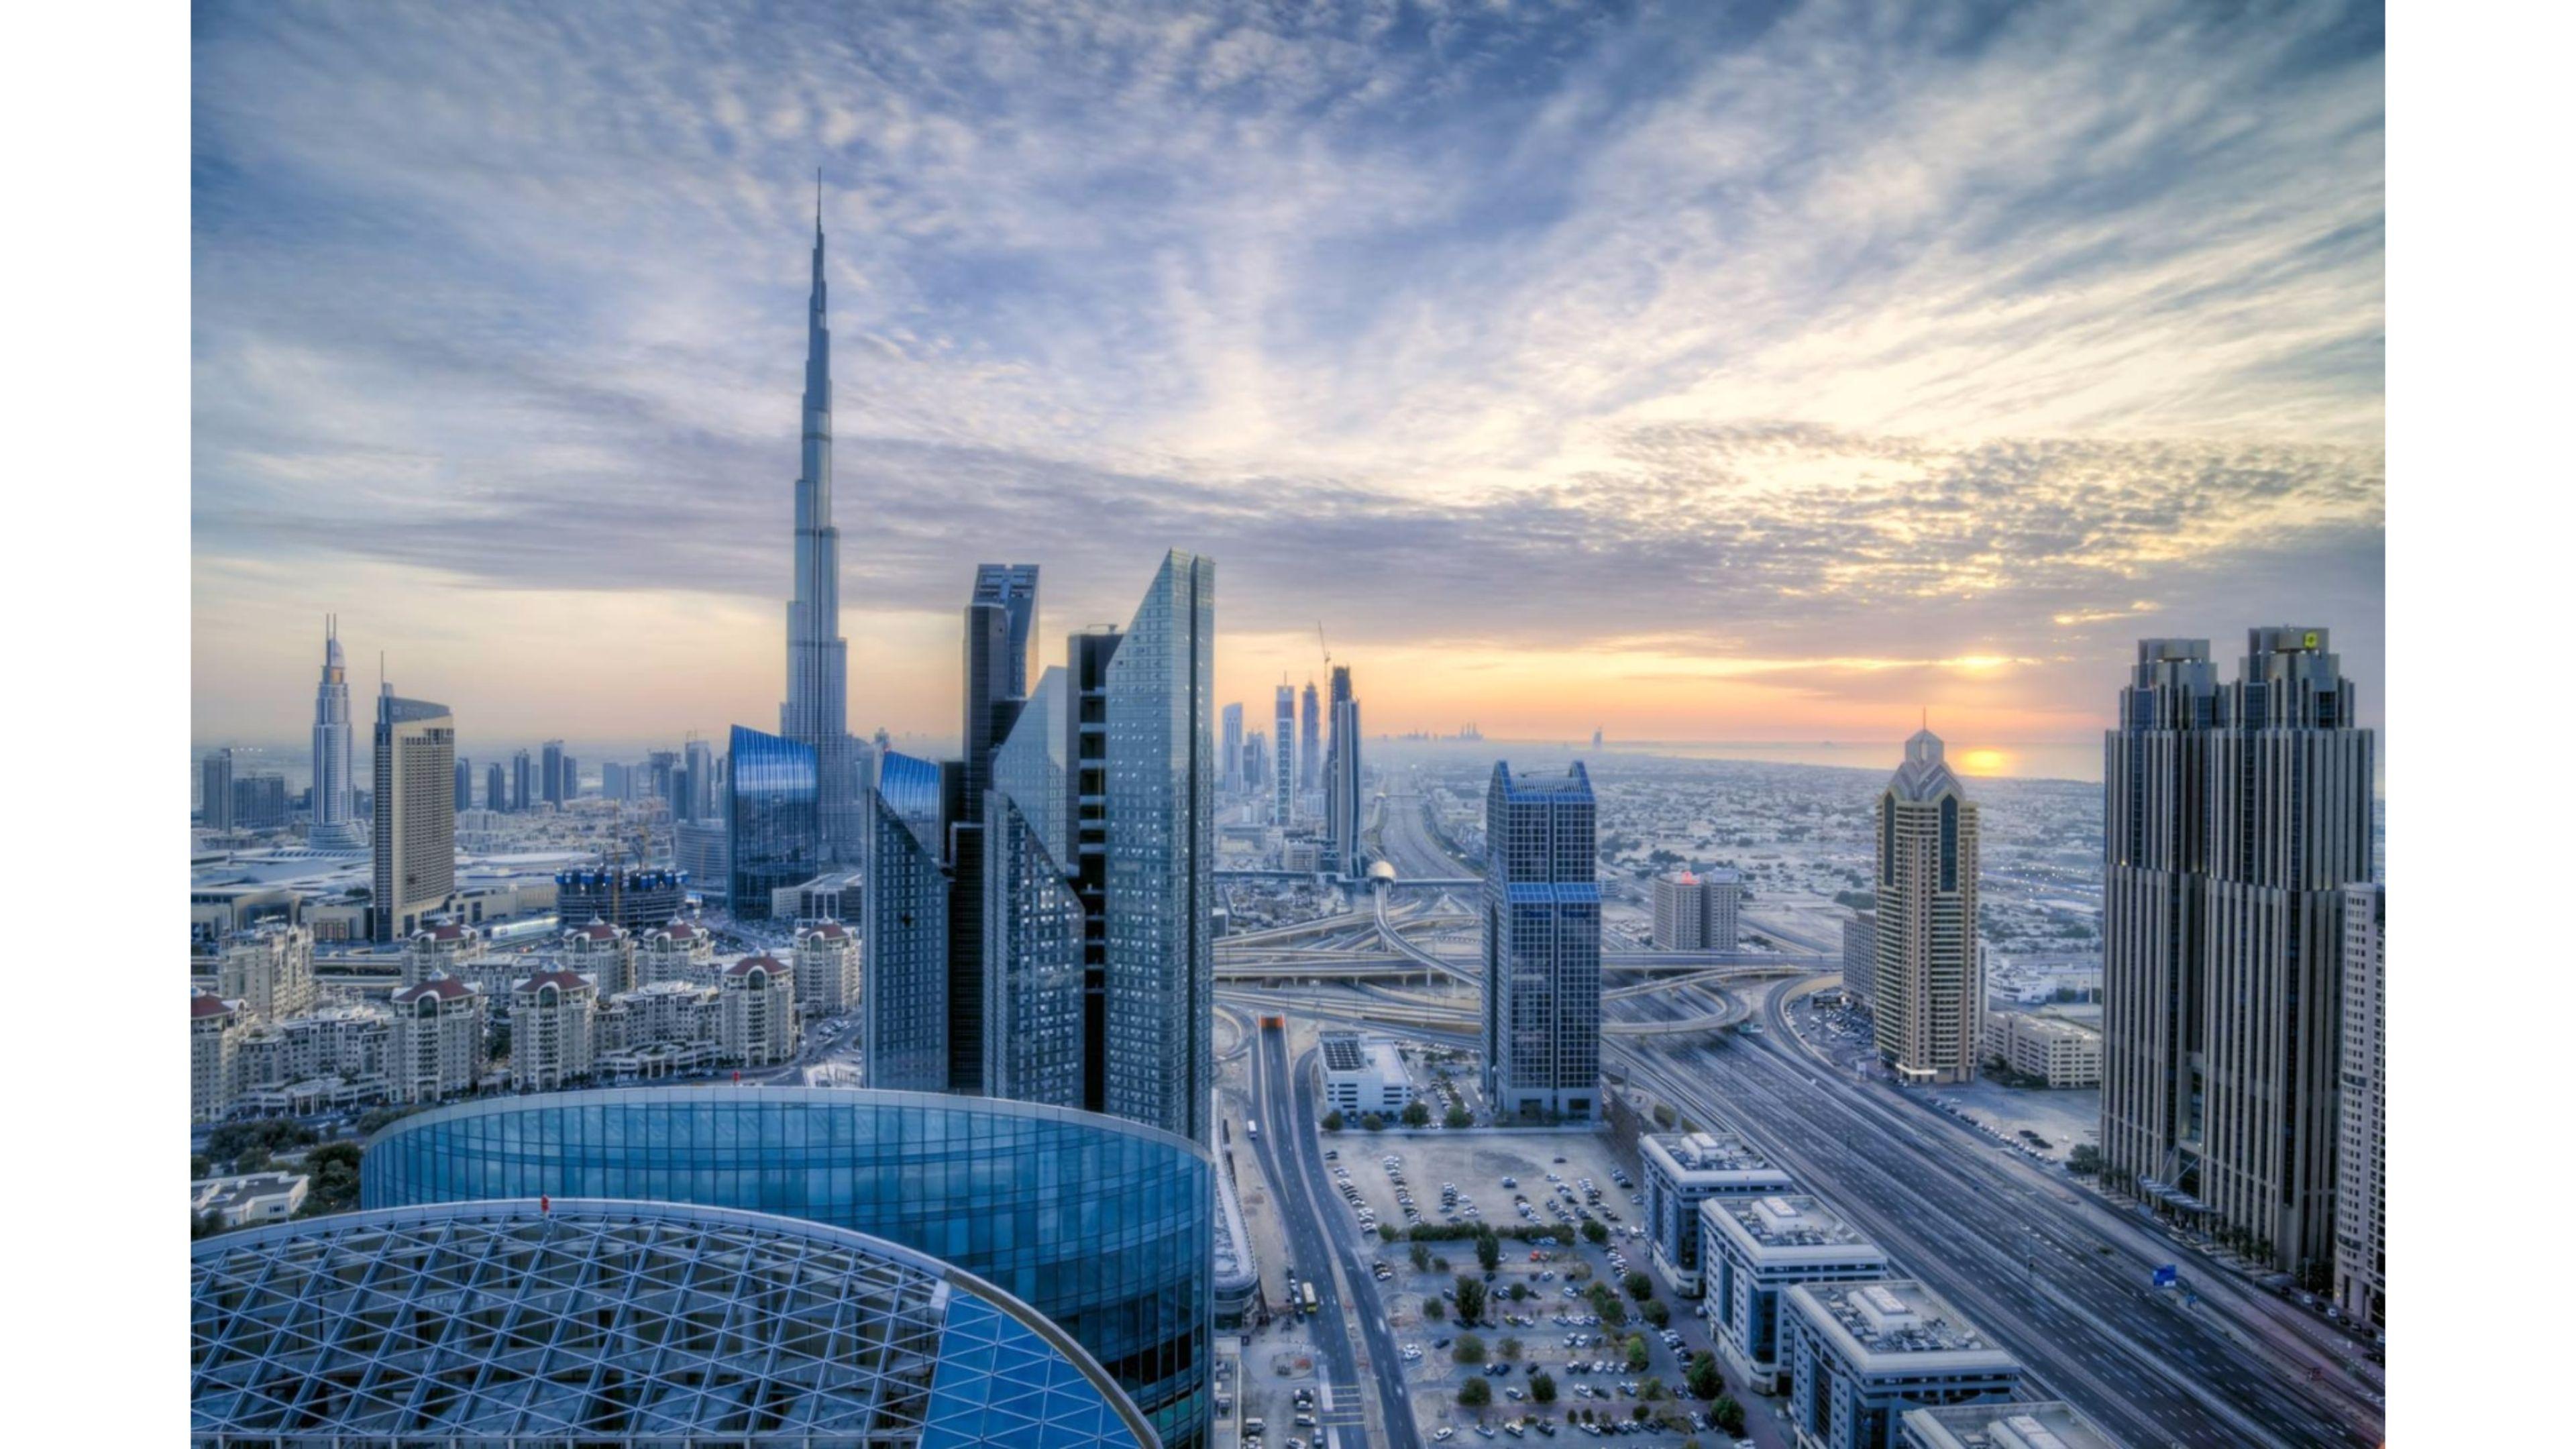 United Arab Emirates Dubai 4K Wallpaper   Tamani Properties 3840x2160